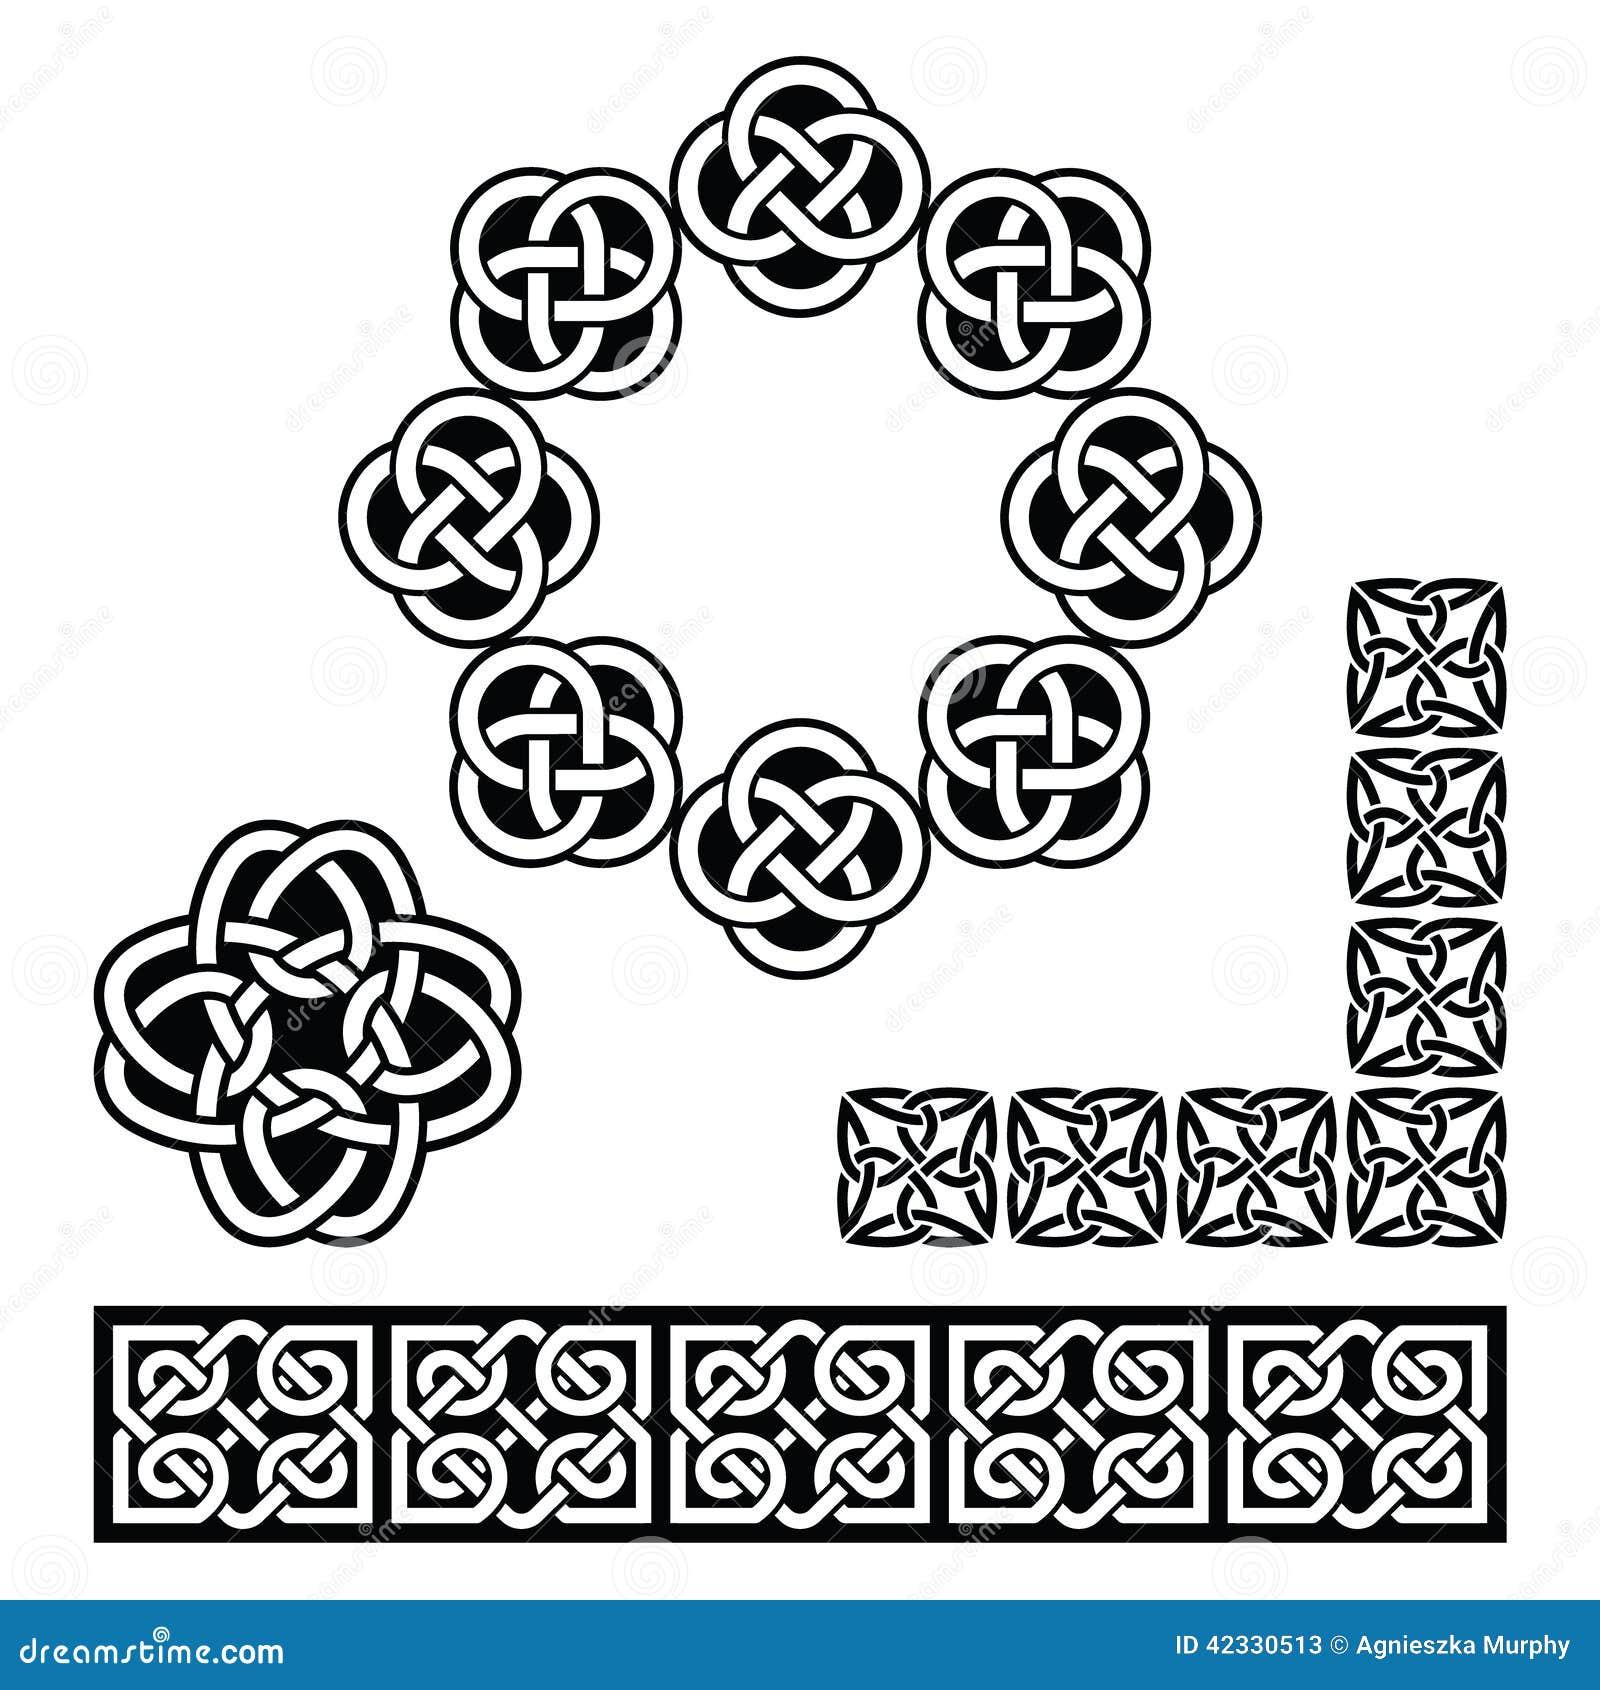 Irish Celtic Design Patterns Knots And Braids Stock Illustration